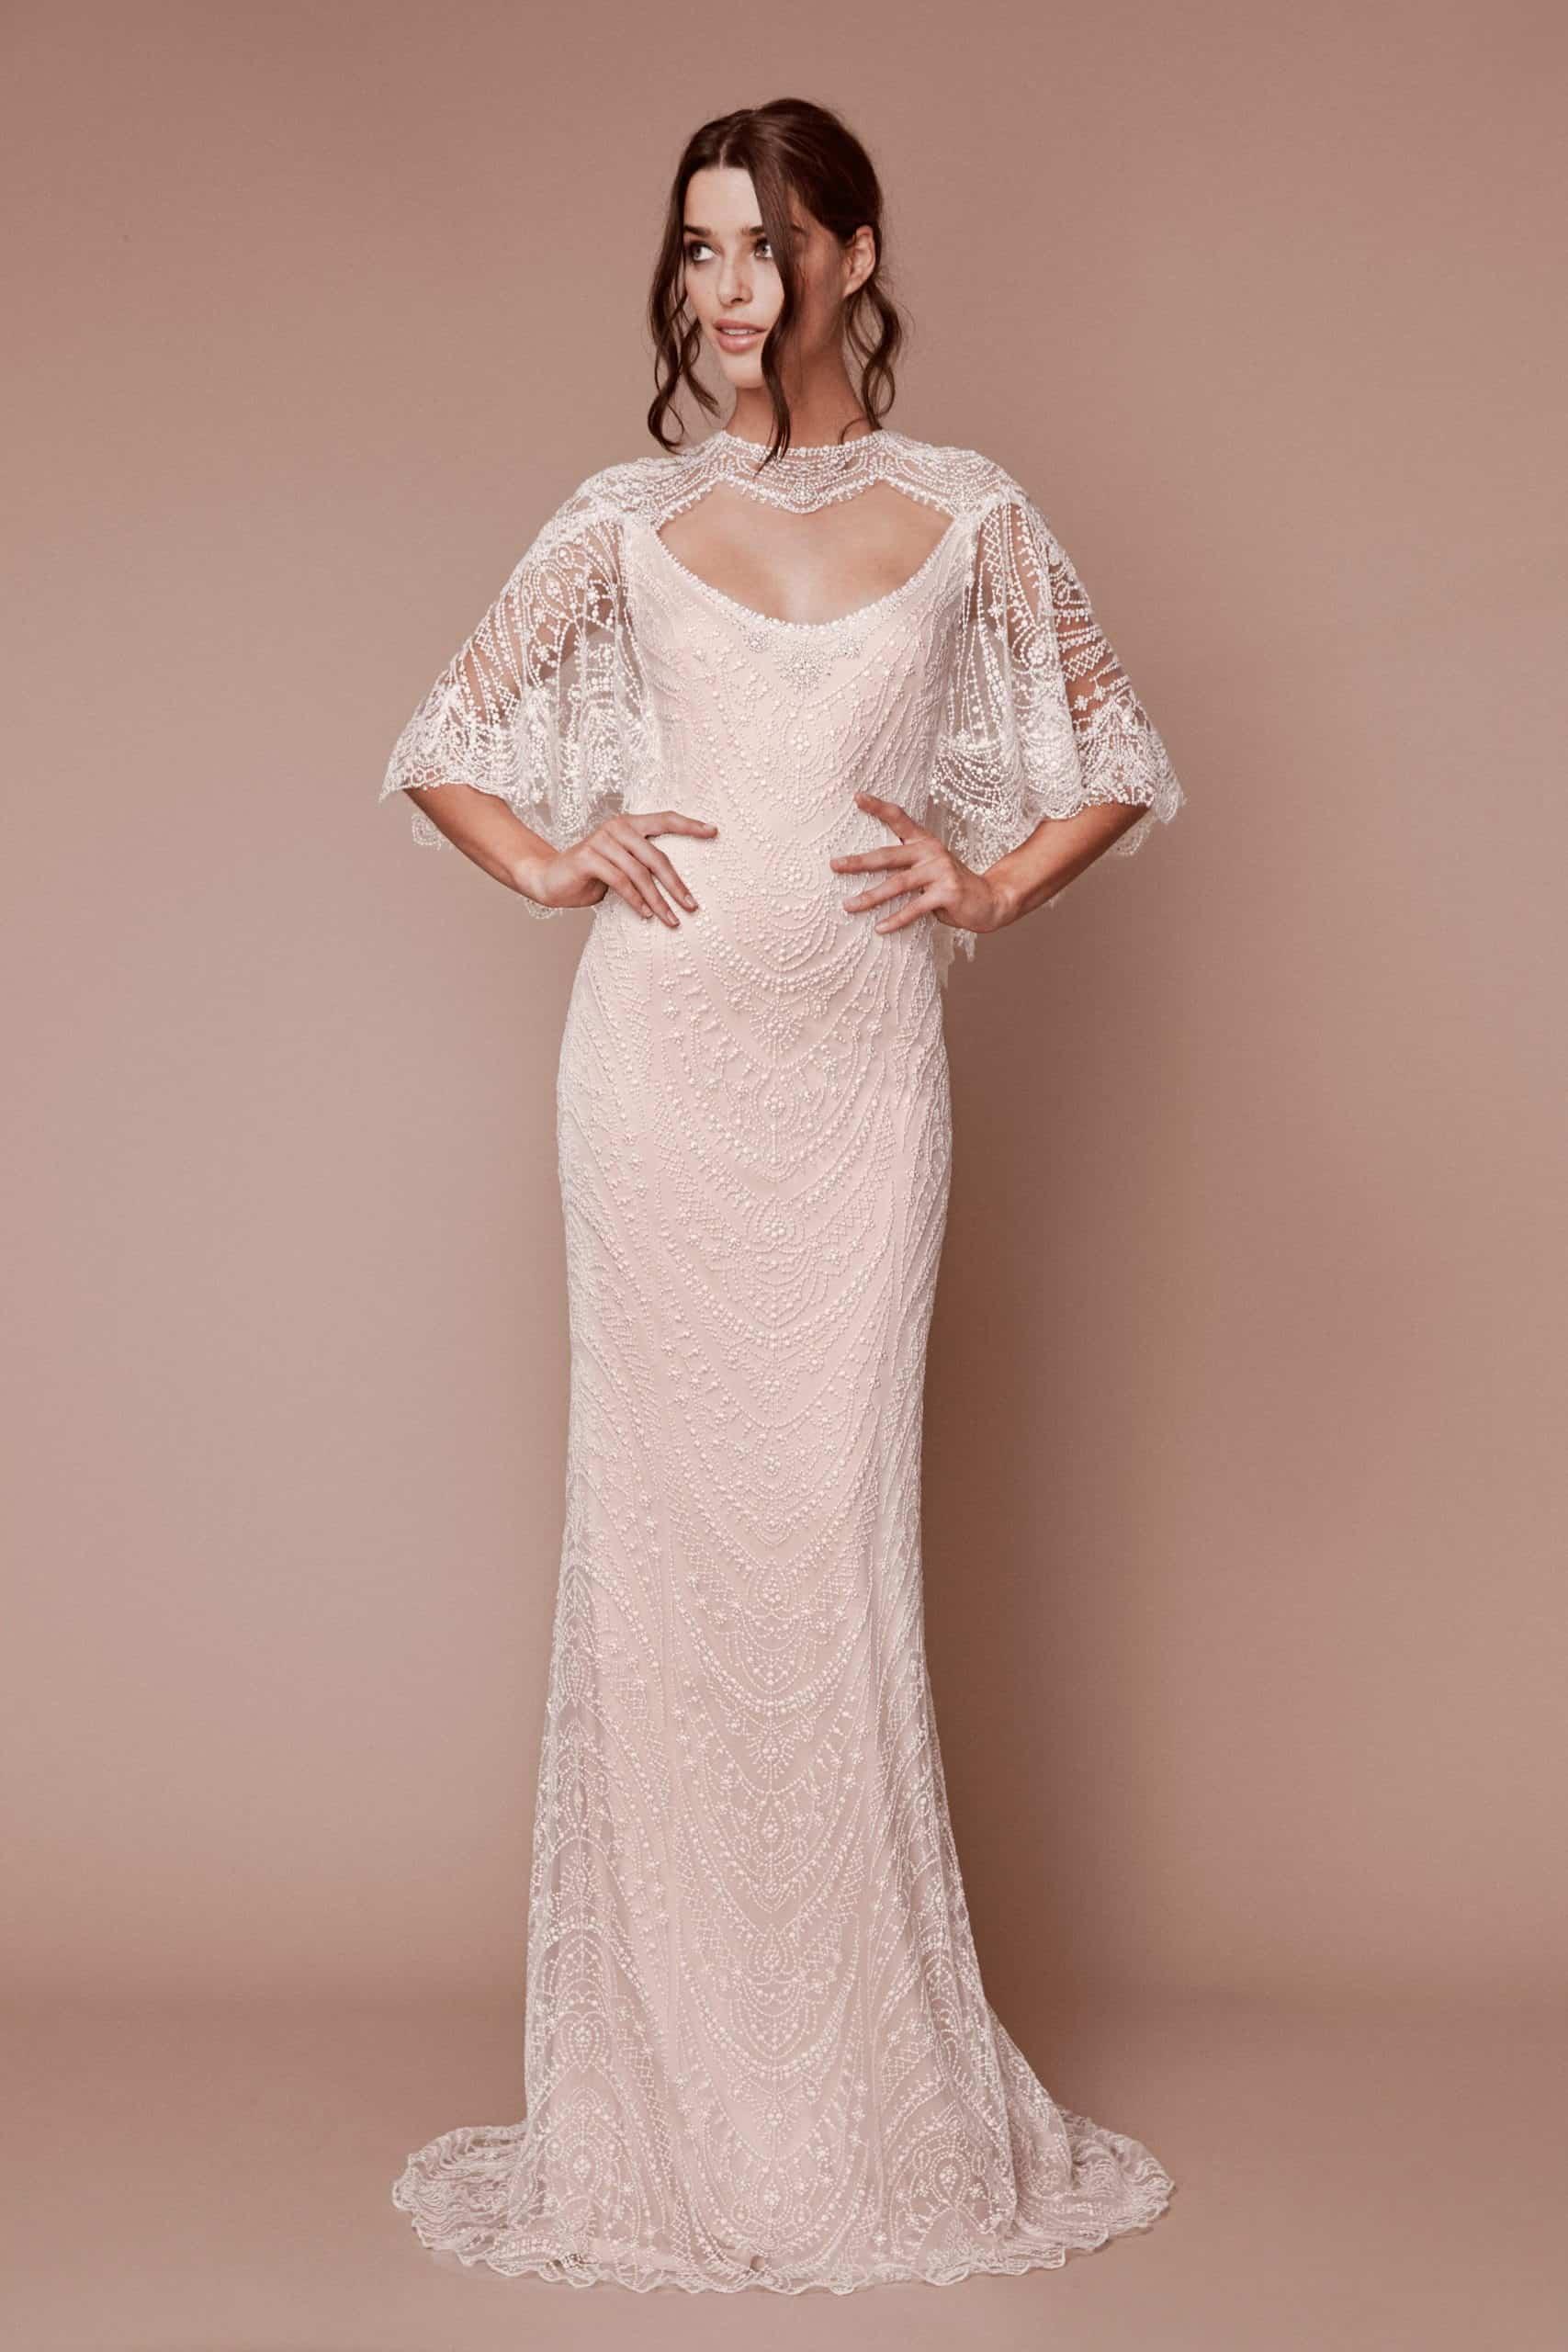 wedding dress with romantic sleeves collection fall 2019 by Tadashi Shoji